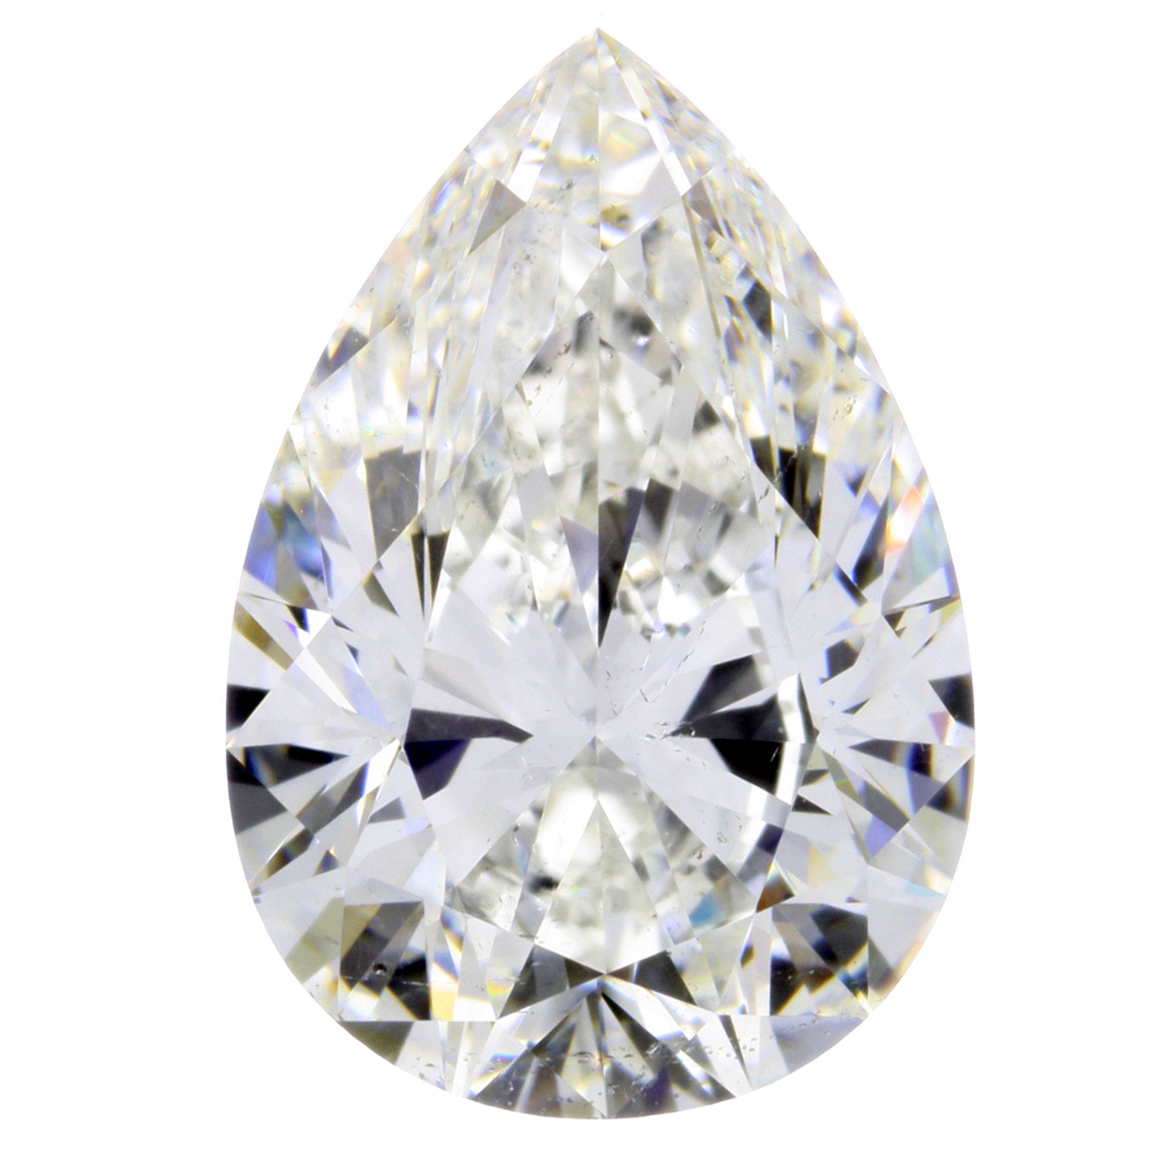 1.51 Carat Pear Cut Loose Diamond SI1 Clarity G Color Excellent Cut